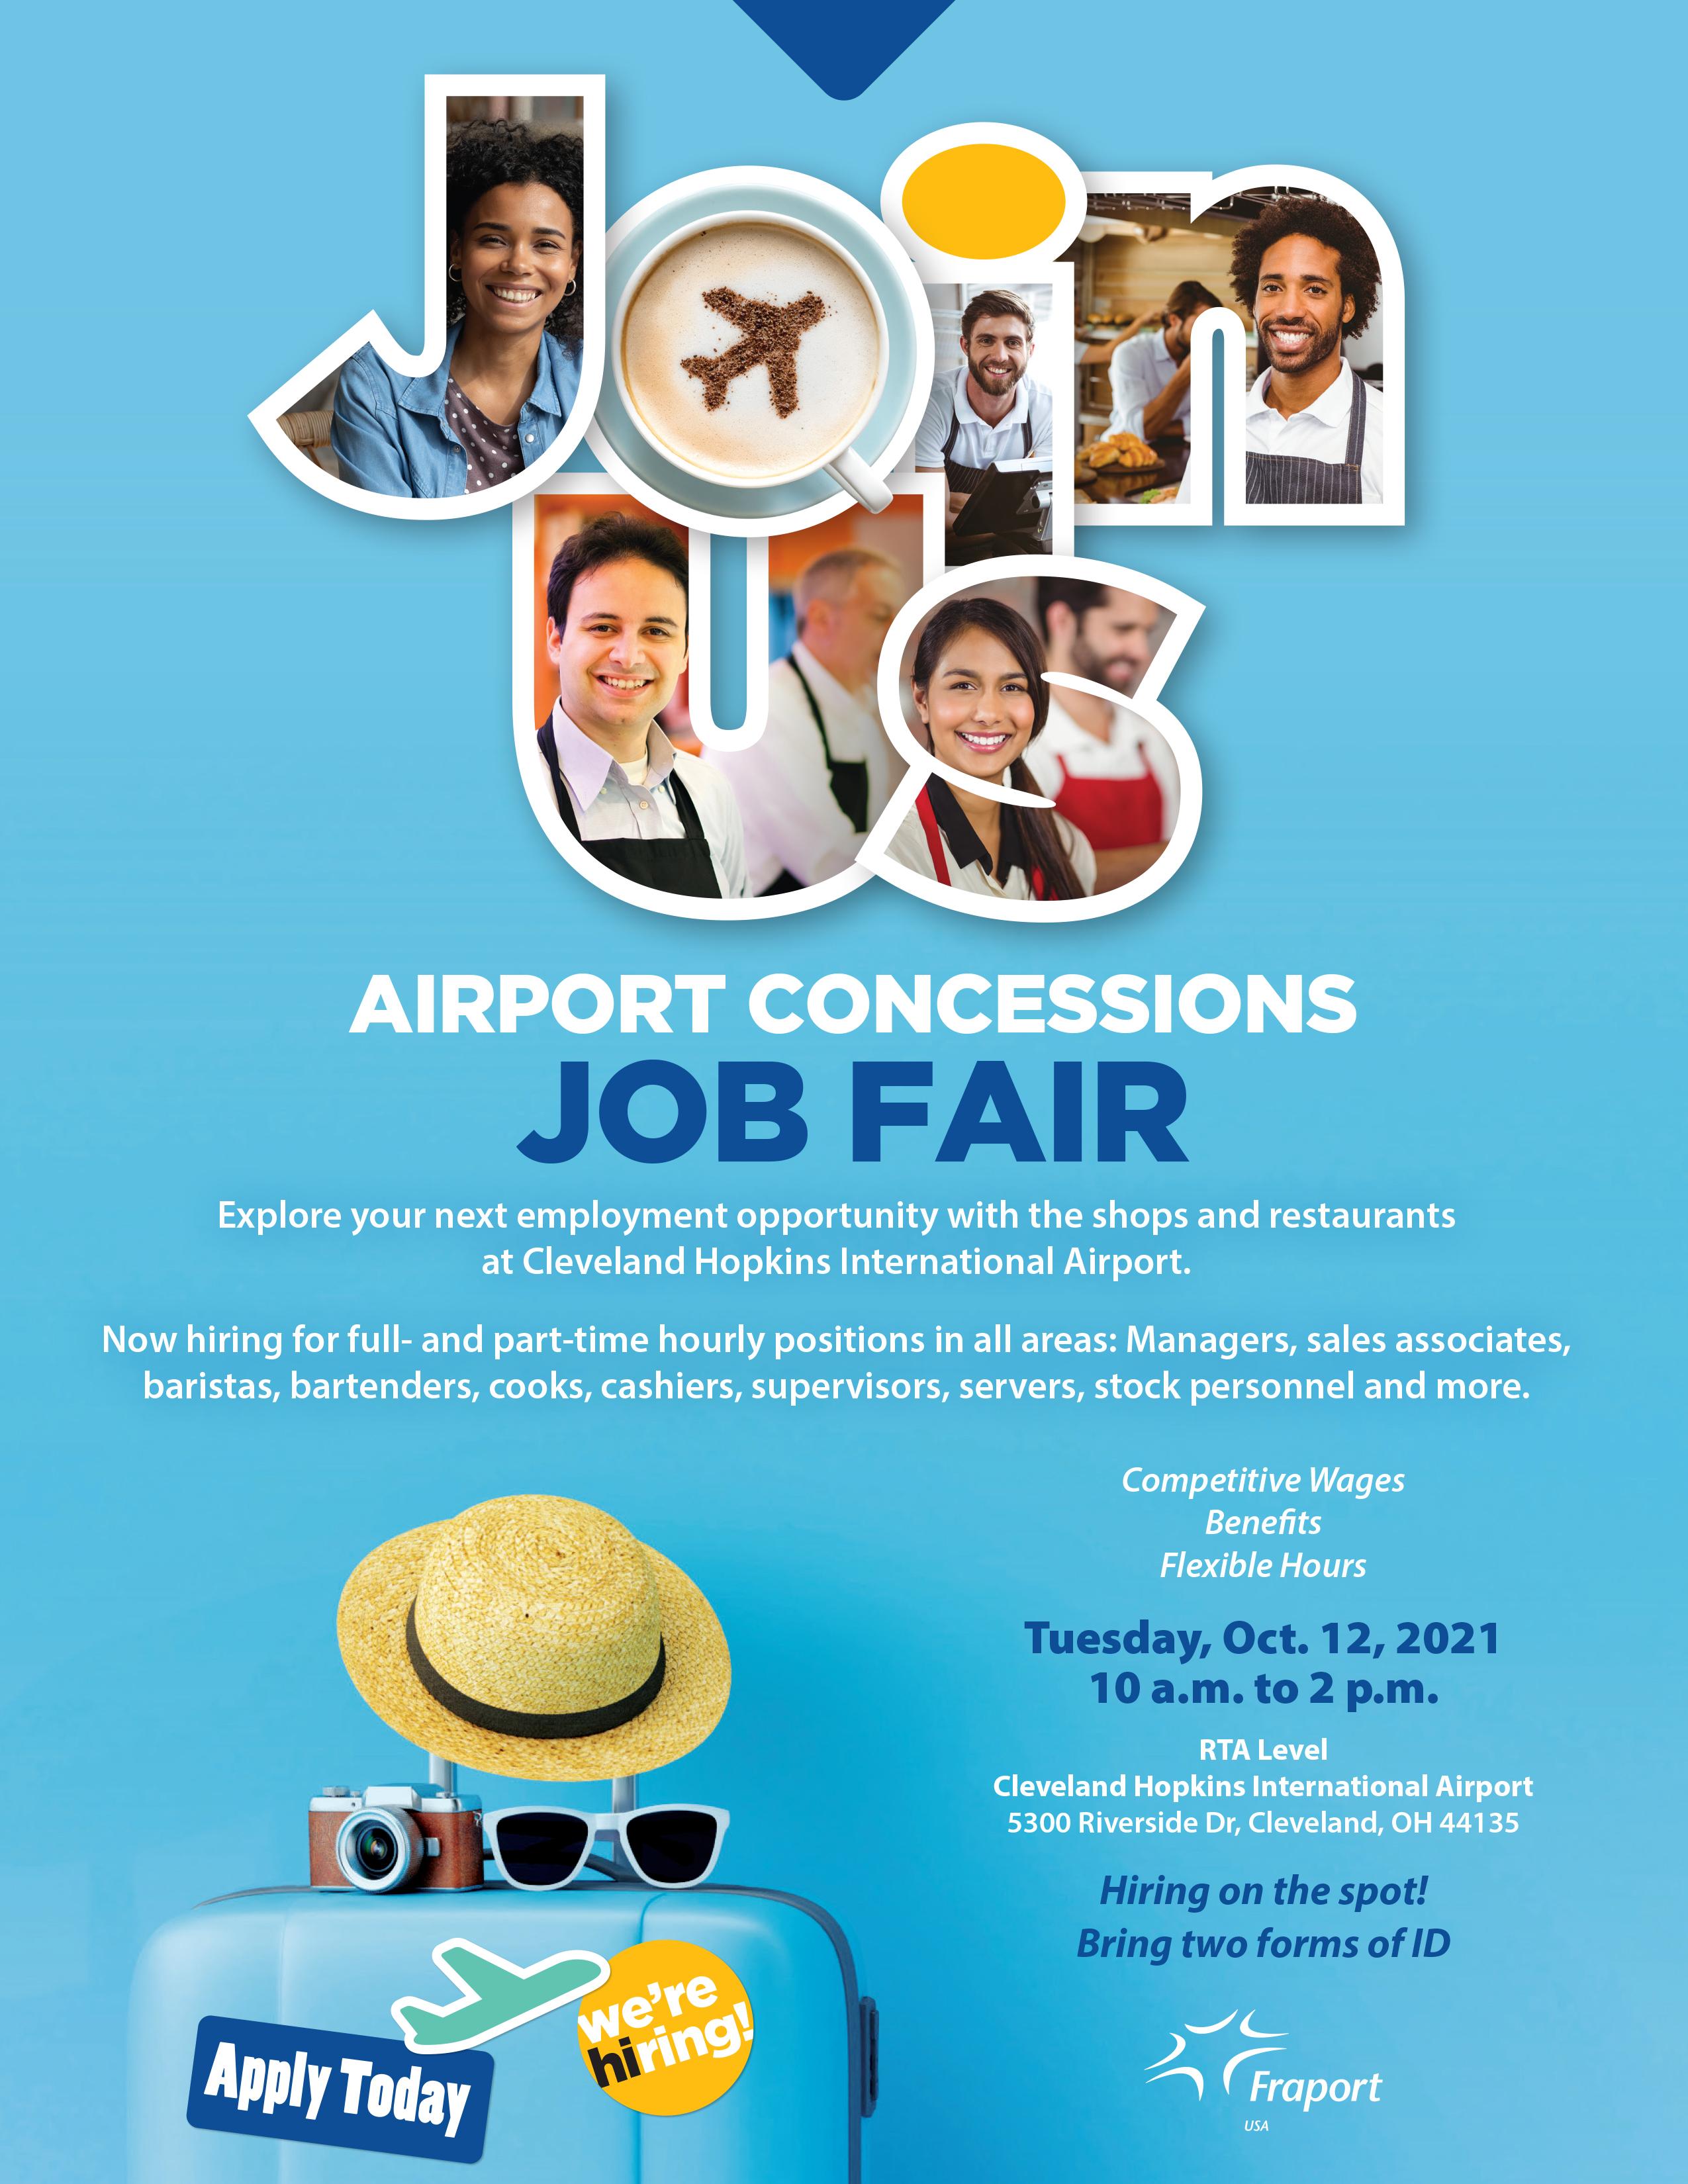 Airport Concessions Job Fair Coming Soon!